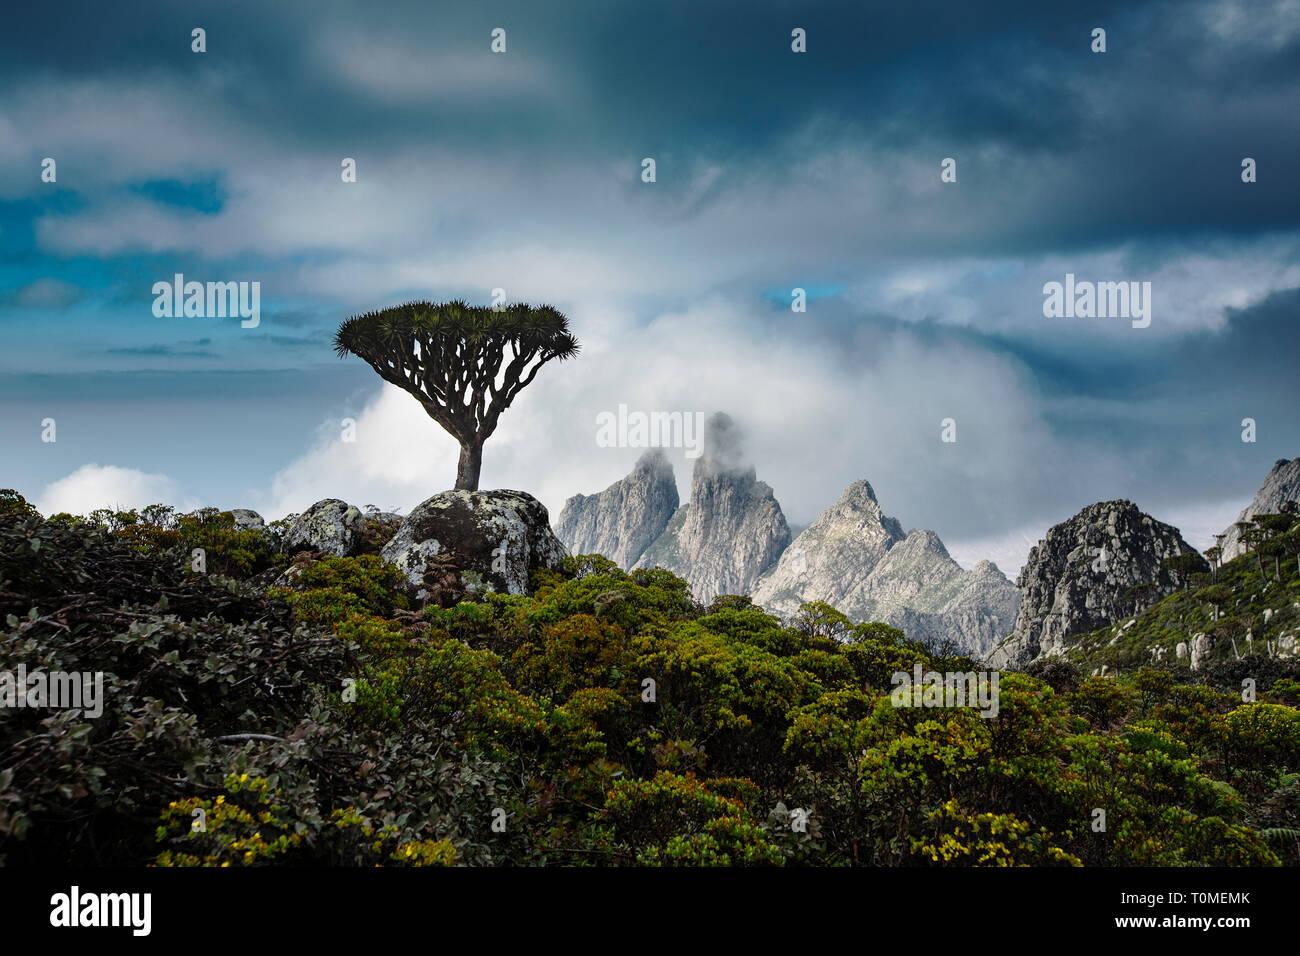 Socotra arbre dragon ou dragon blood tree, Dracaena cinnabari, Hajhir montagnes, l'île de Socotra, au Yémen Banque D'Images